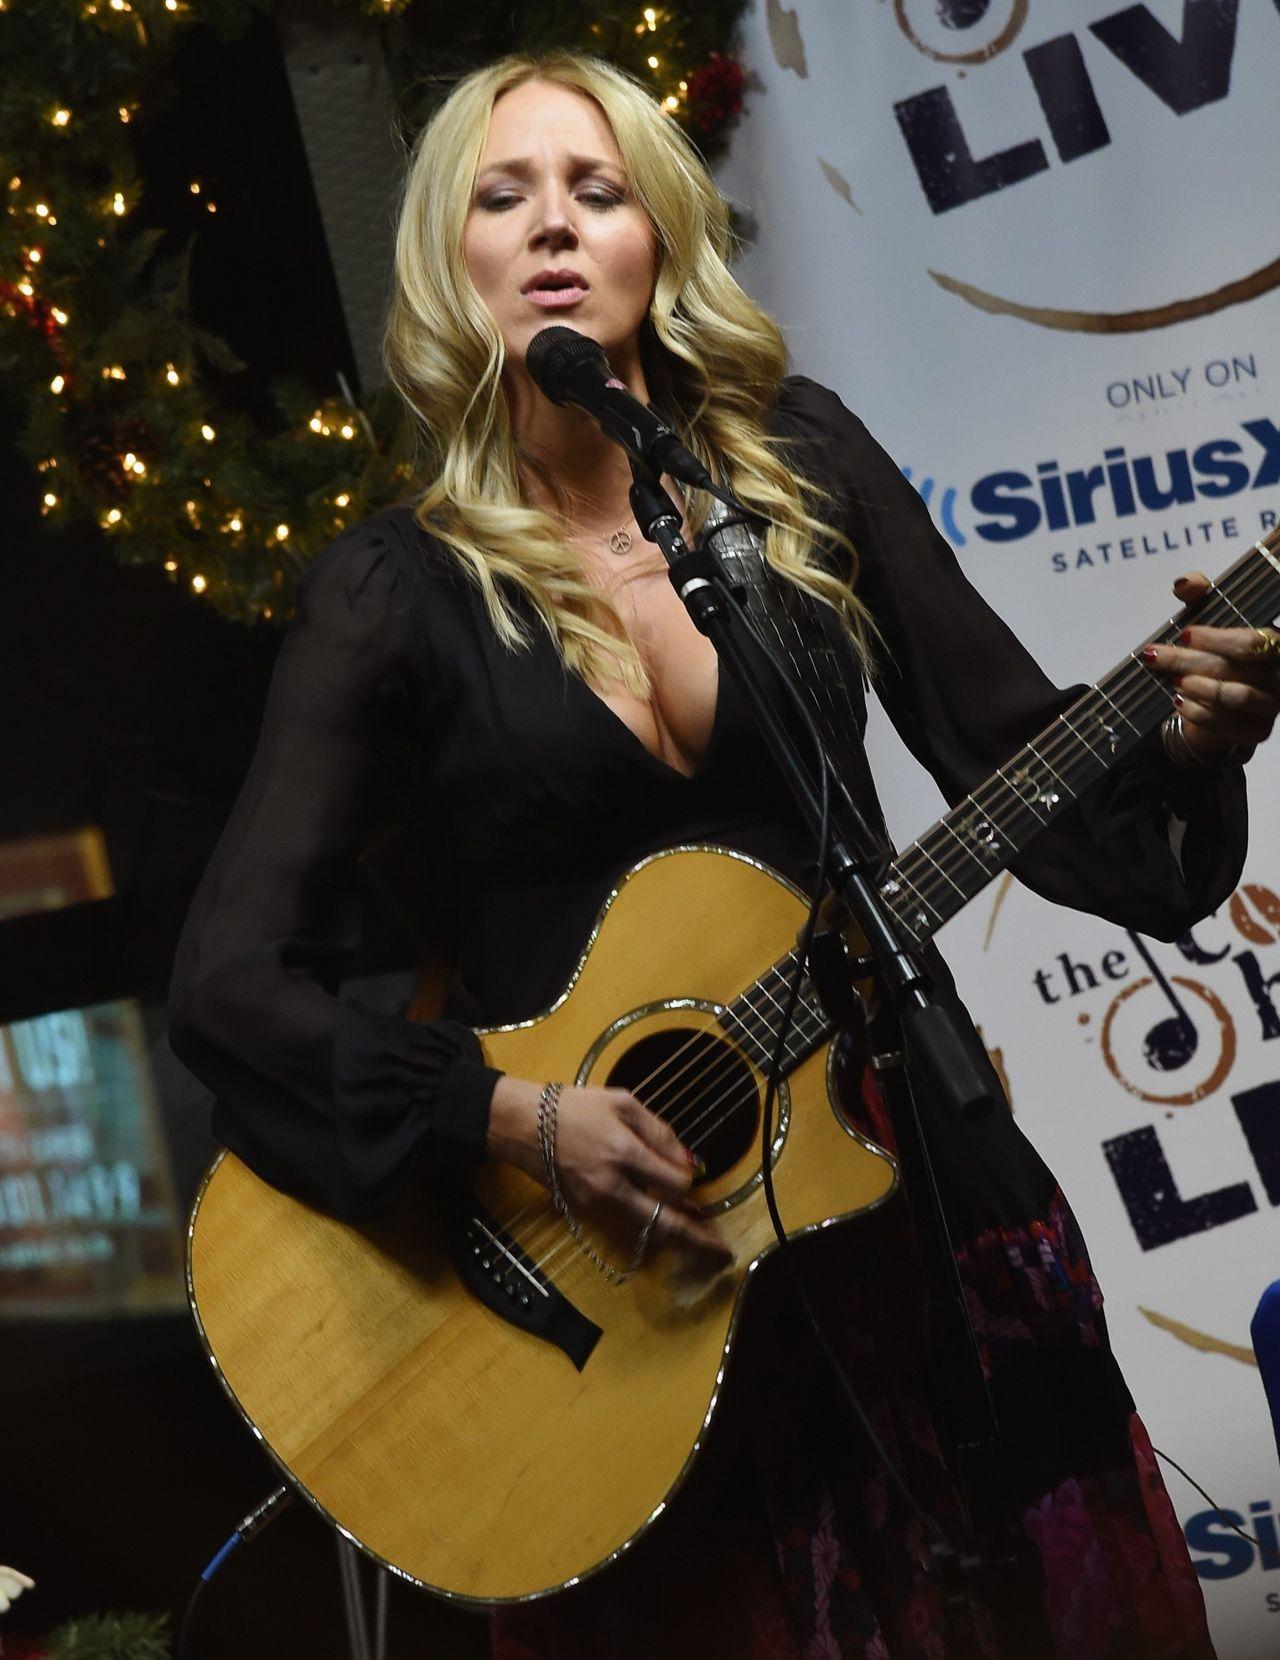 Jewel Kilcher 2015 Siriusxm Acoustic Christmas With